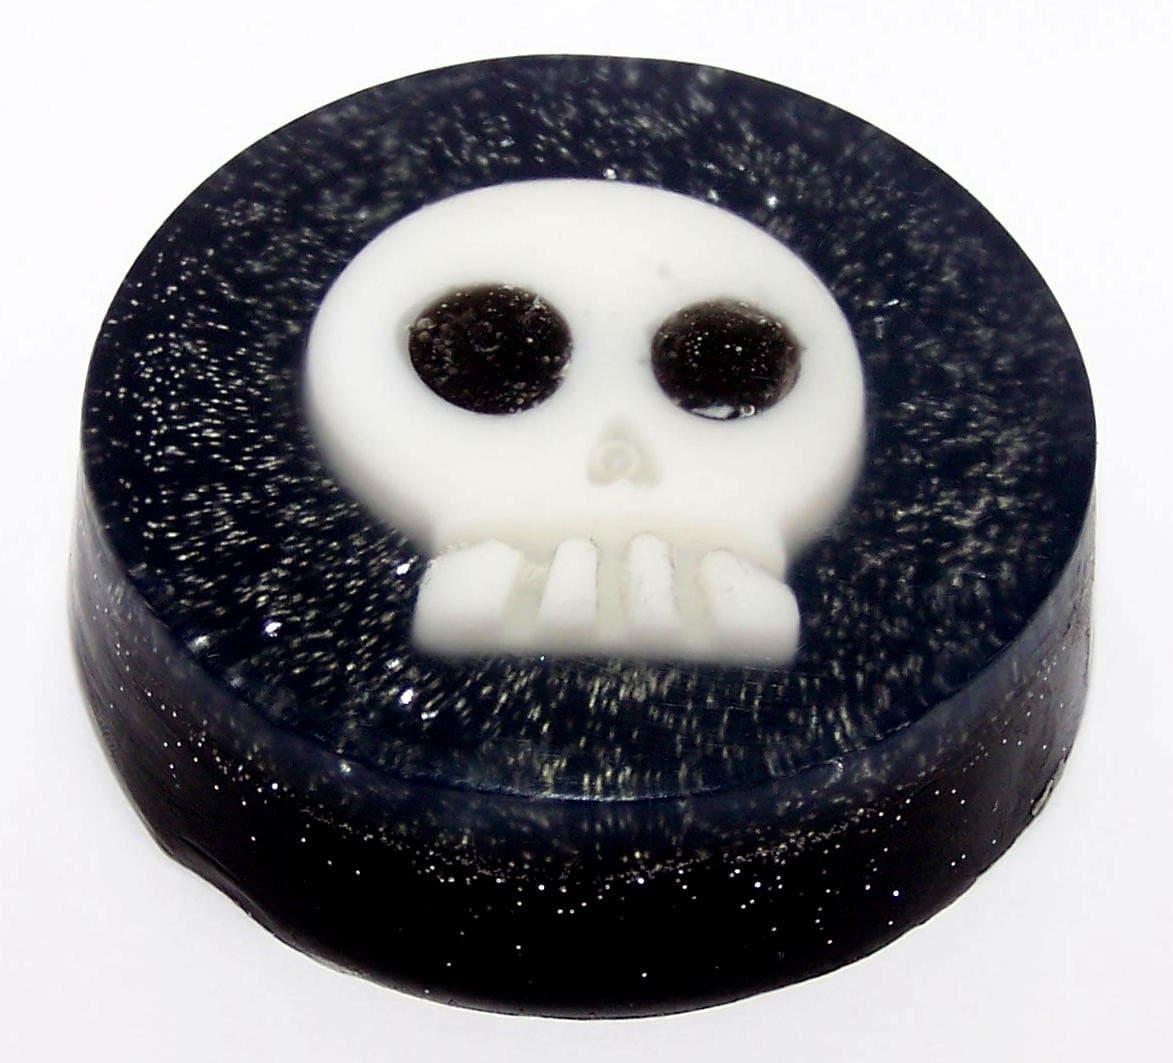 Sparkly Skull Soap